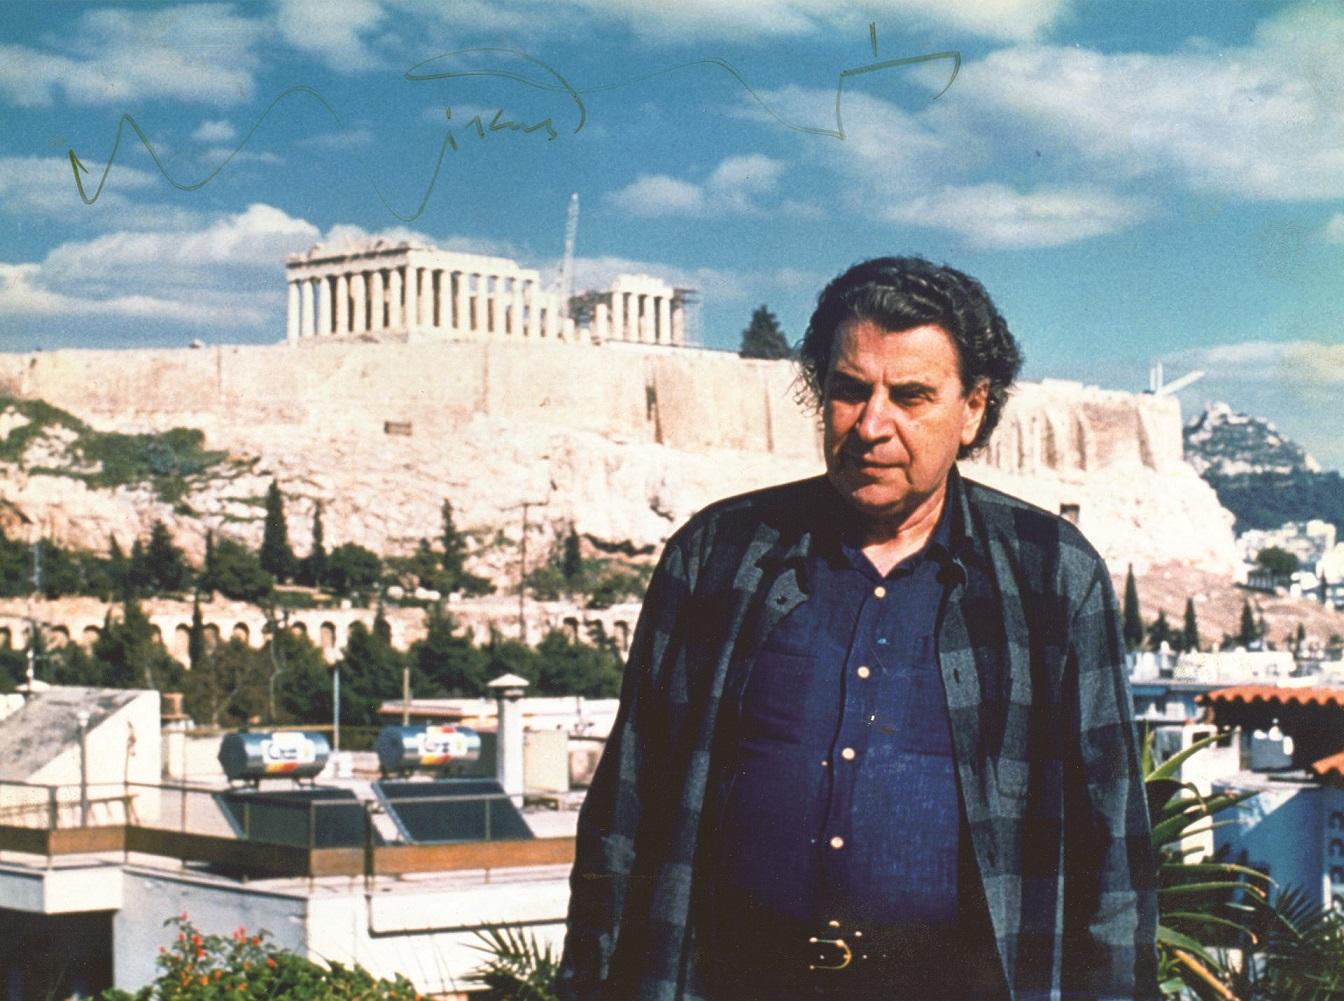 COSMOTE TV Μίκης Θεοδωράκης 3